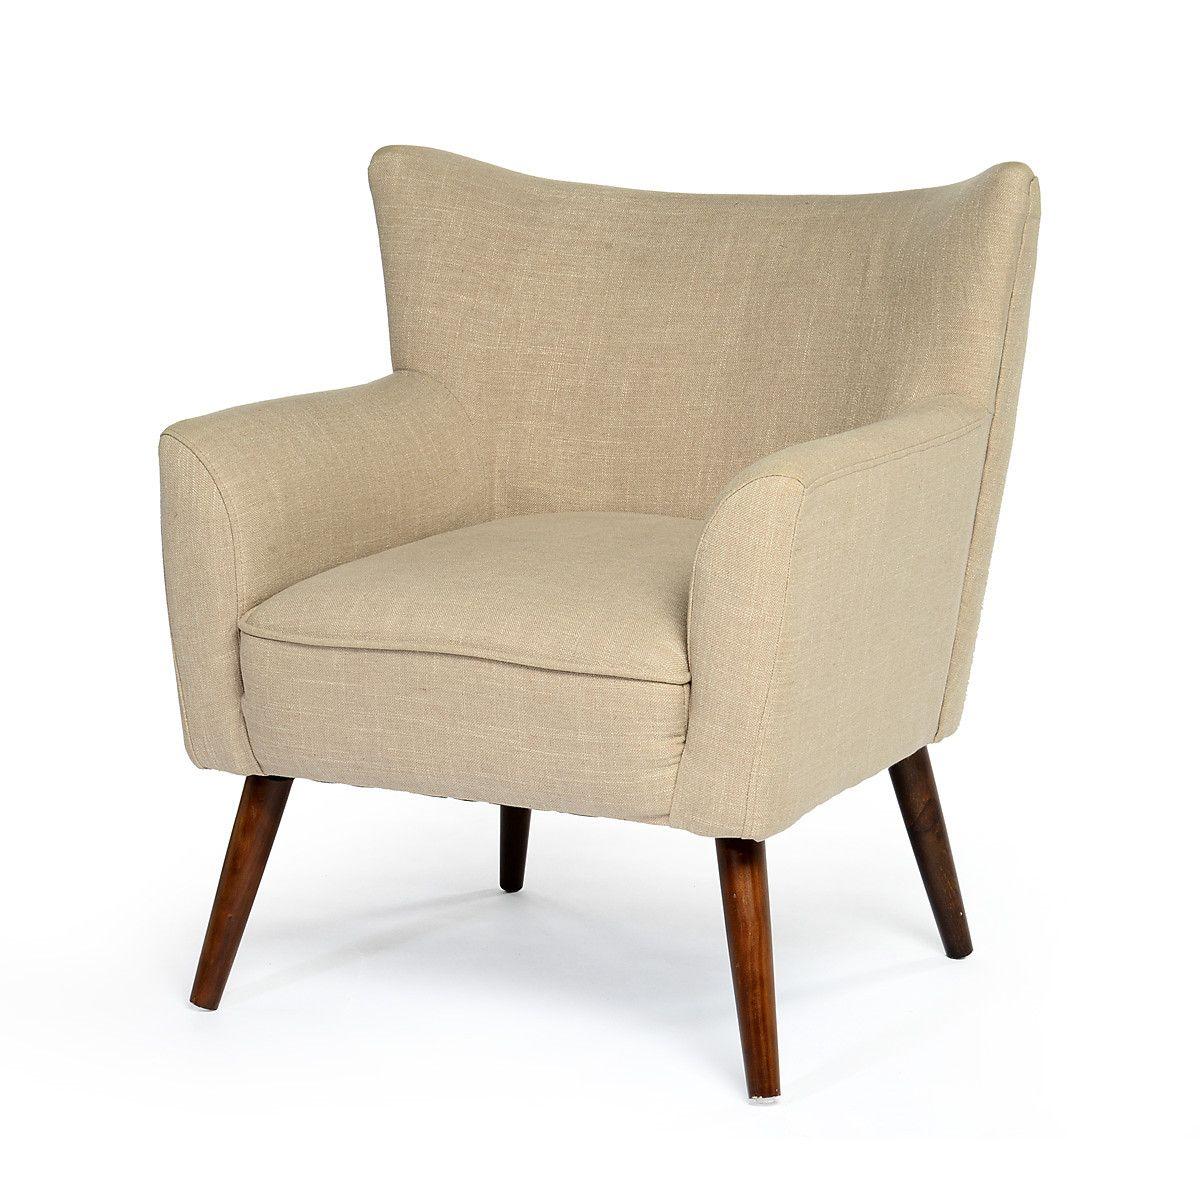 sessel beige ca l 70 x b 69 x h 78 cm oprema i stoli. Black Bedroom Furniture Sets. Home Design Ideas